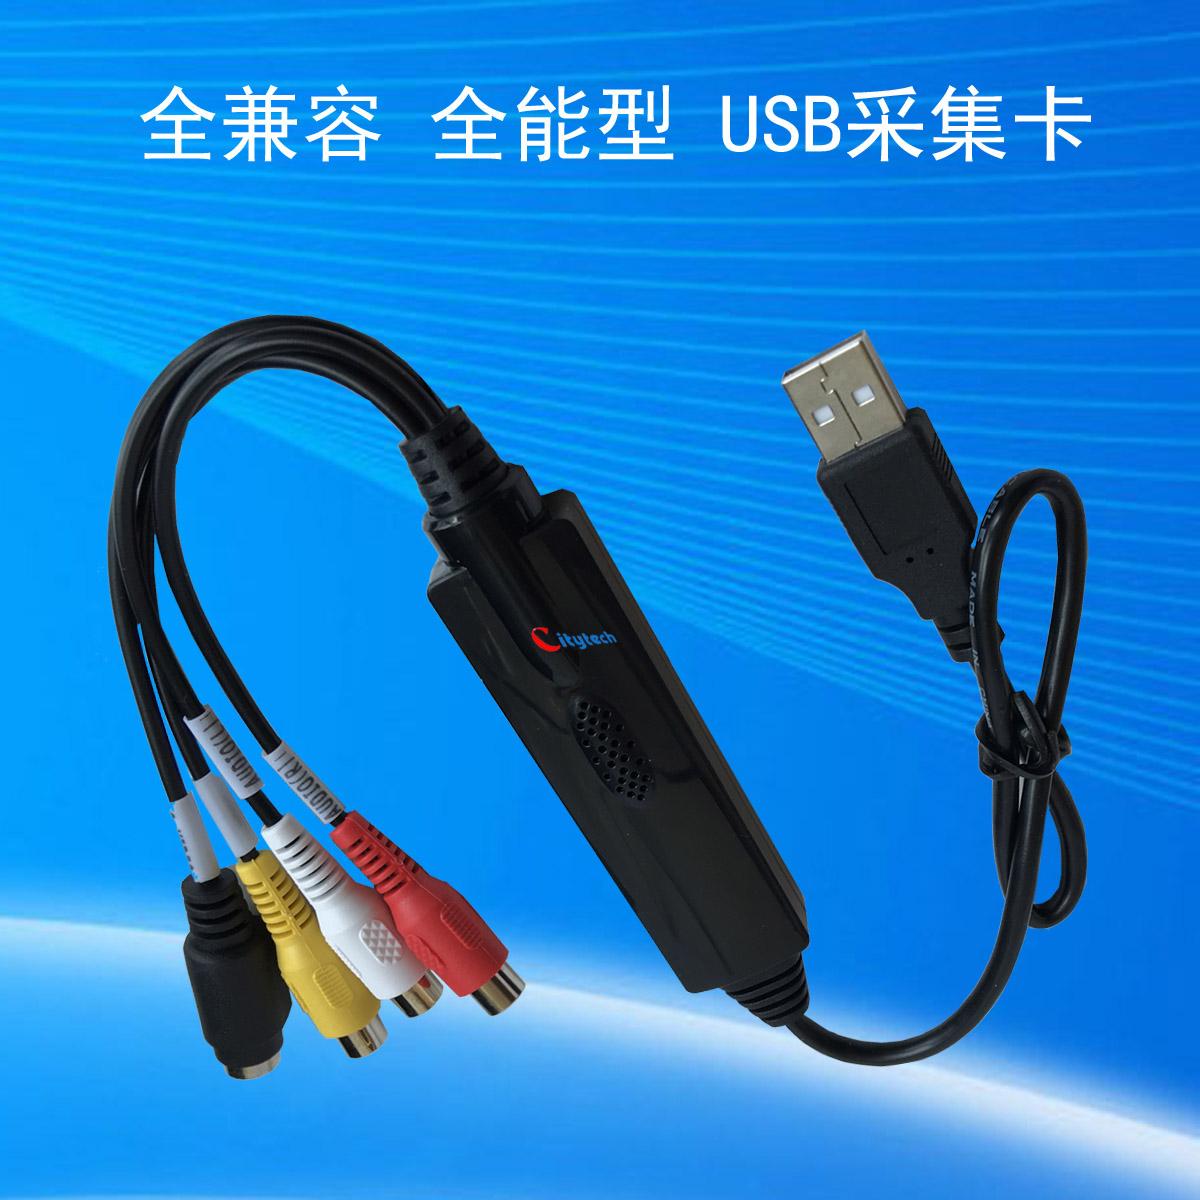 USB采集卡音视频棒医疗显微镜内窥镜视频会议车载平板手机安卓OTG